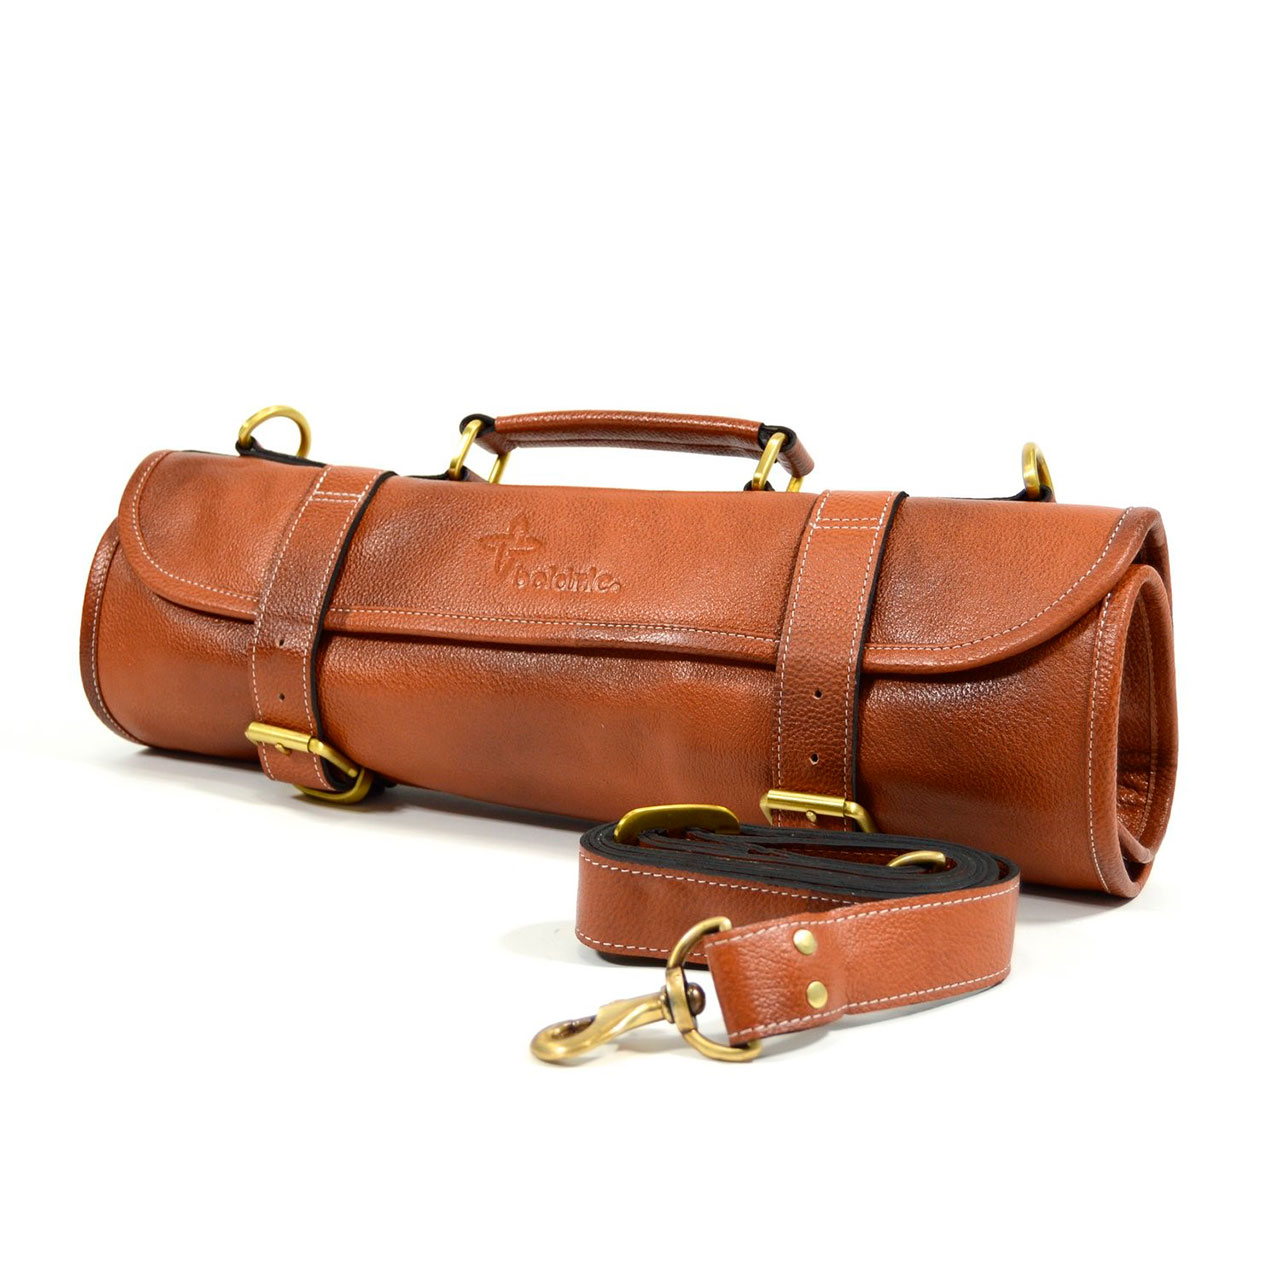 b5a3e71a194f Boldric 9-Pocket Brown Leather Roll Knife Bag